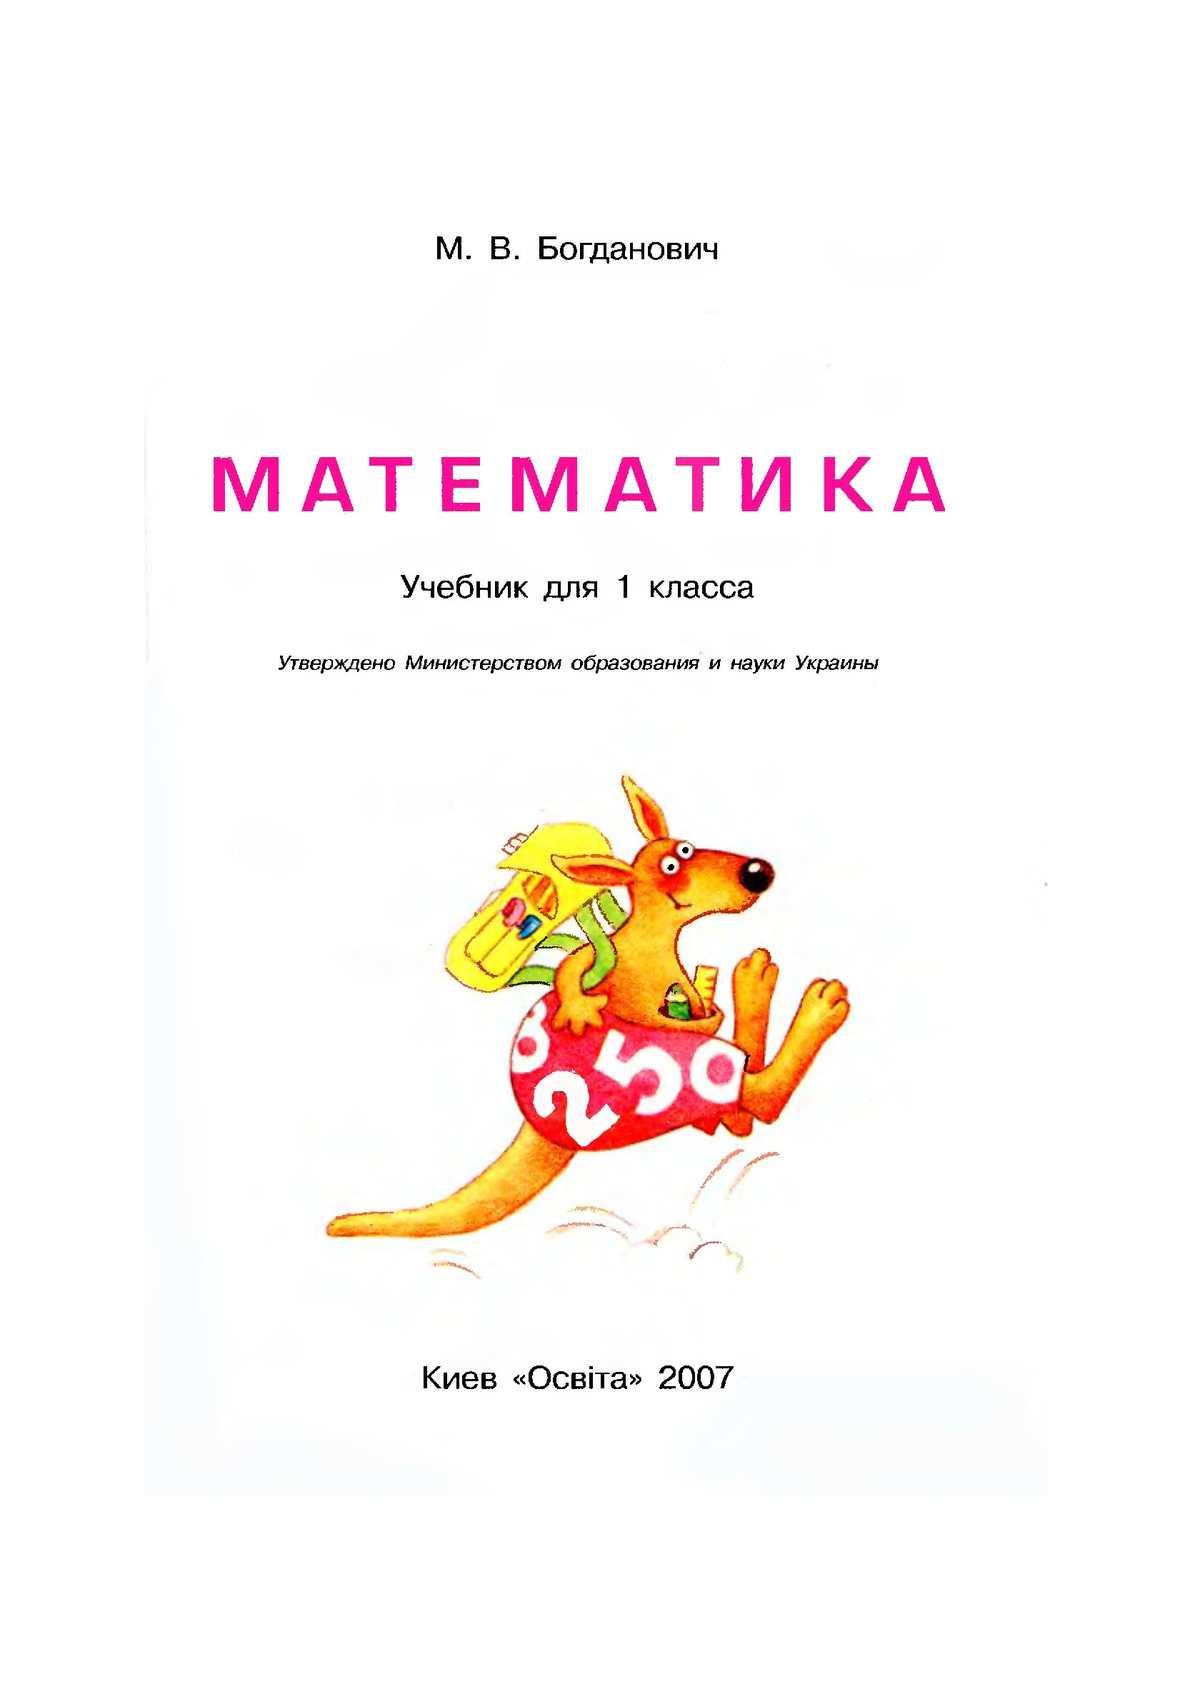 Matematika_1_1_Bogdanovich